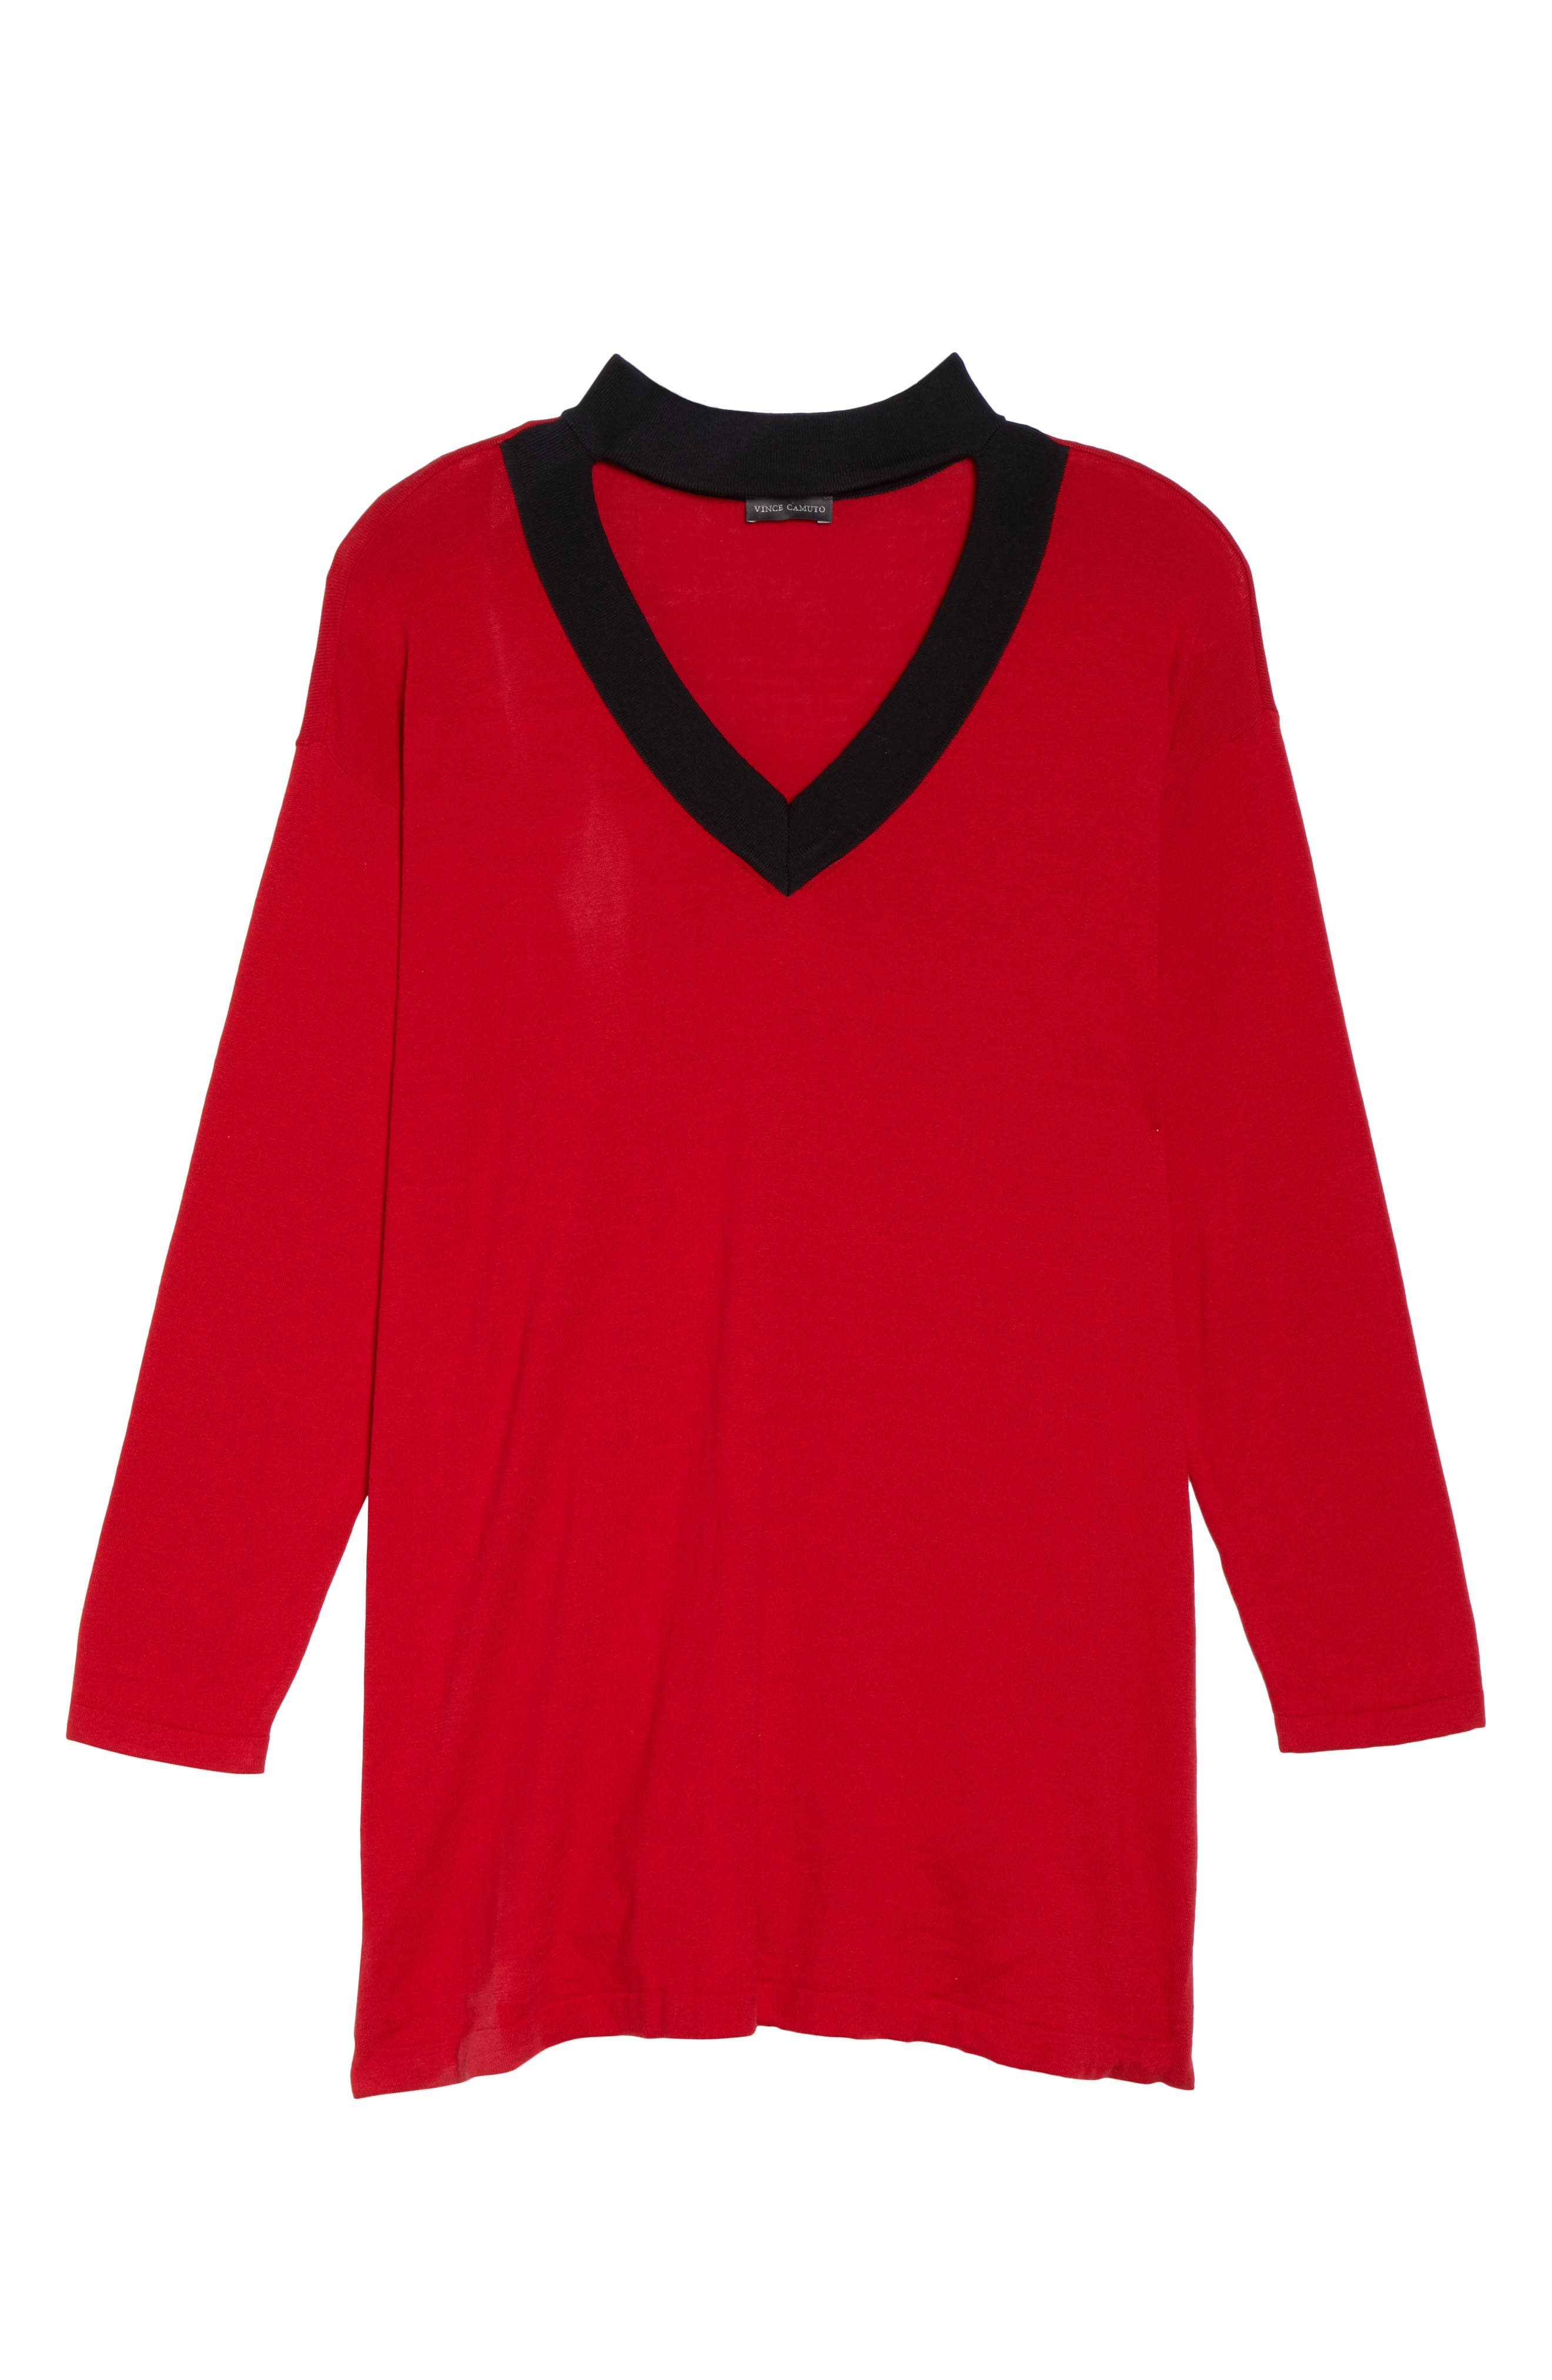 Vince Camuto Choker Neck Sweater (Plus Size)